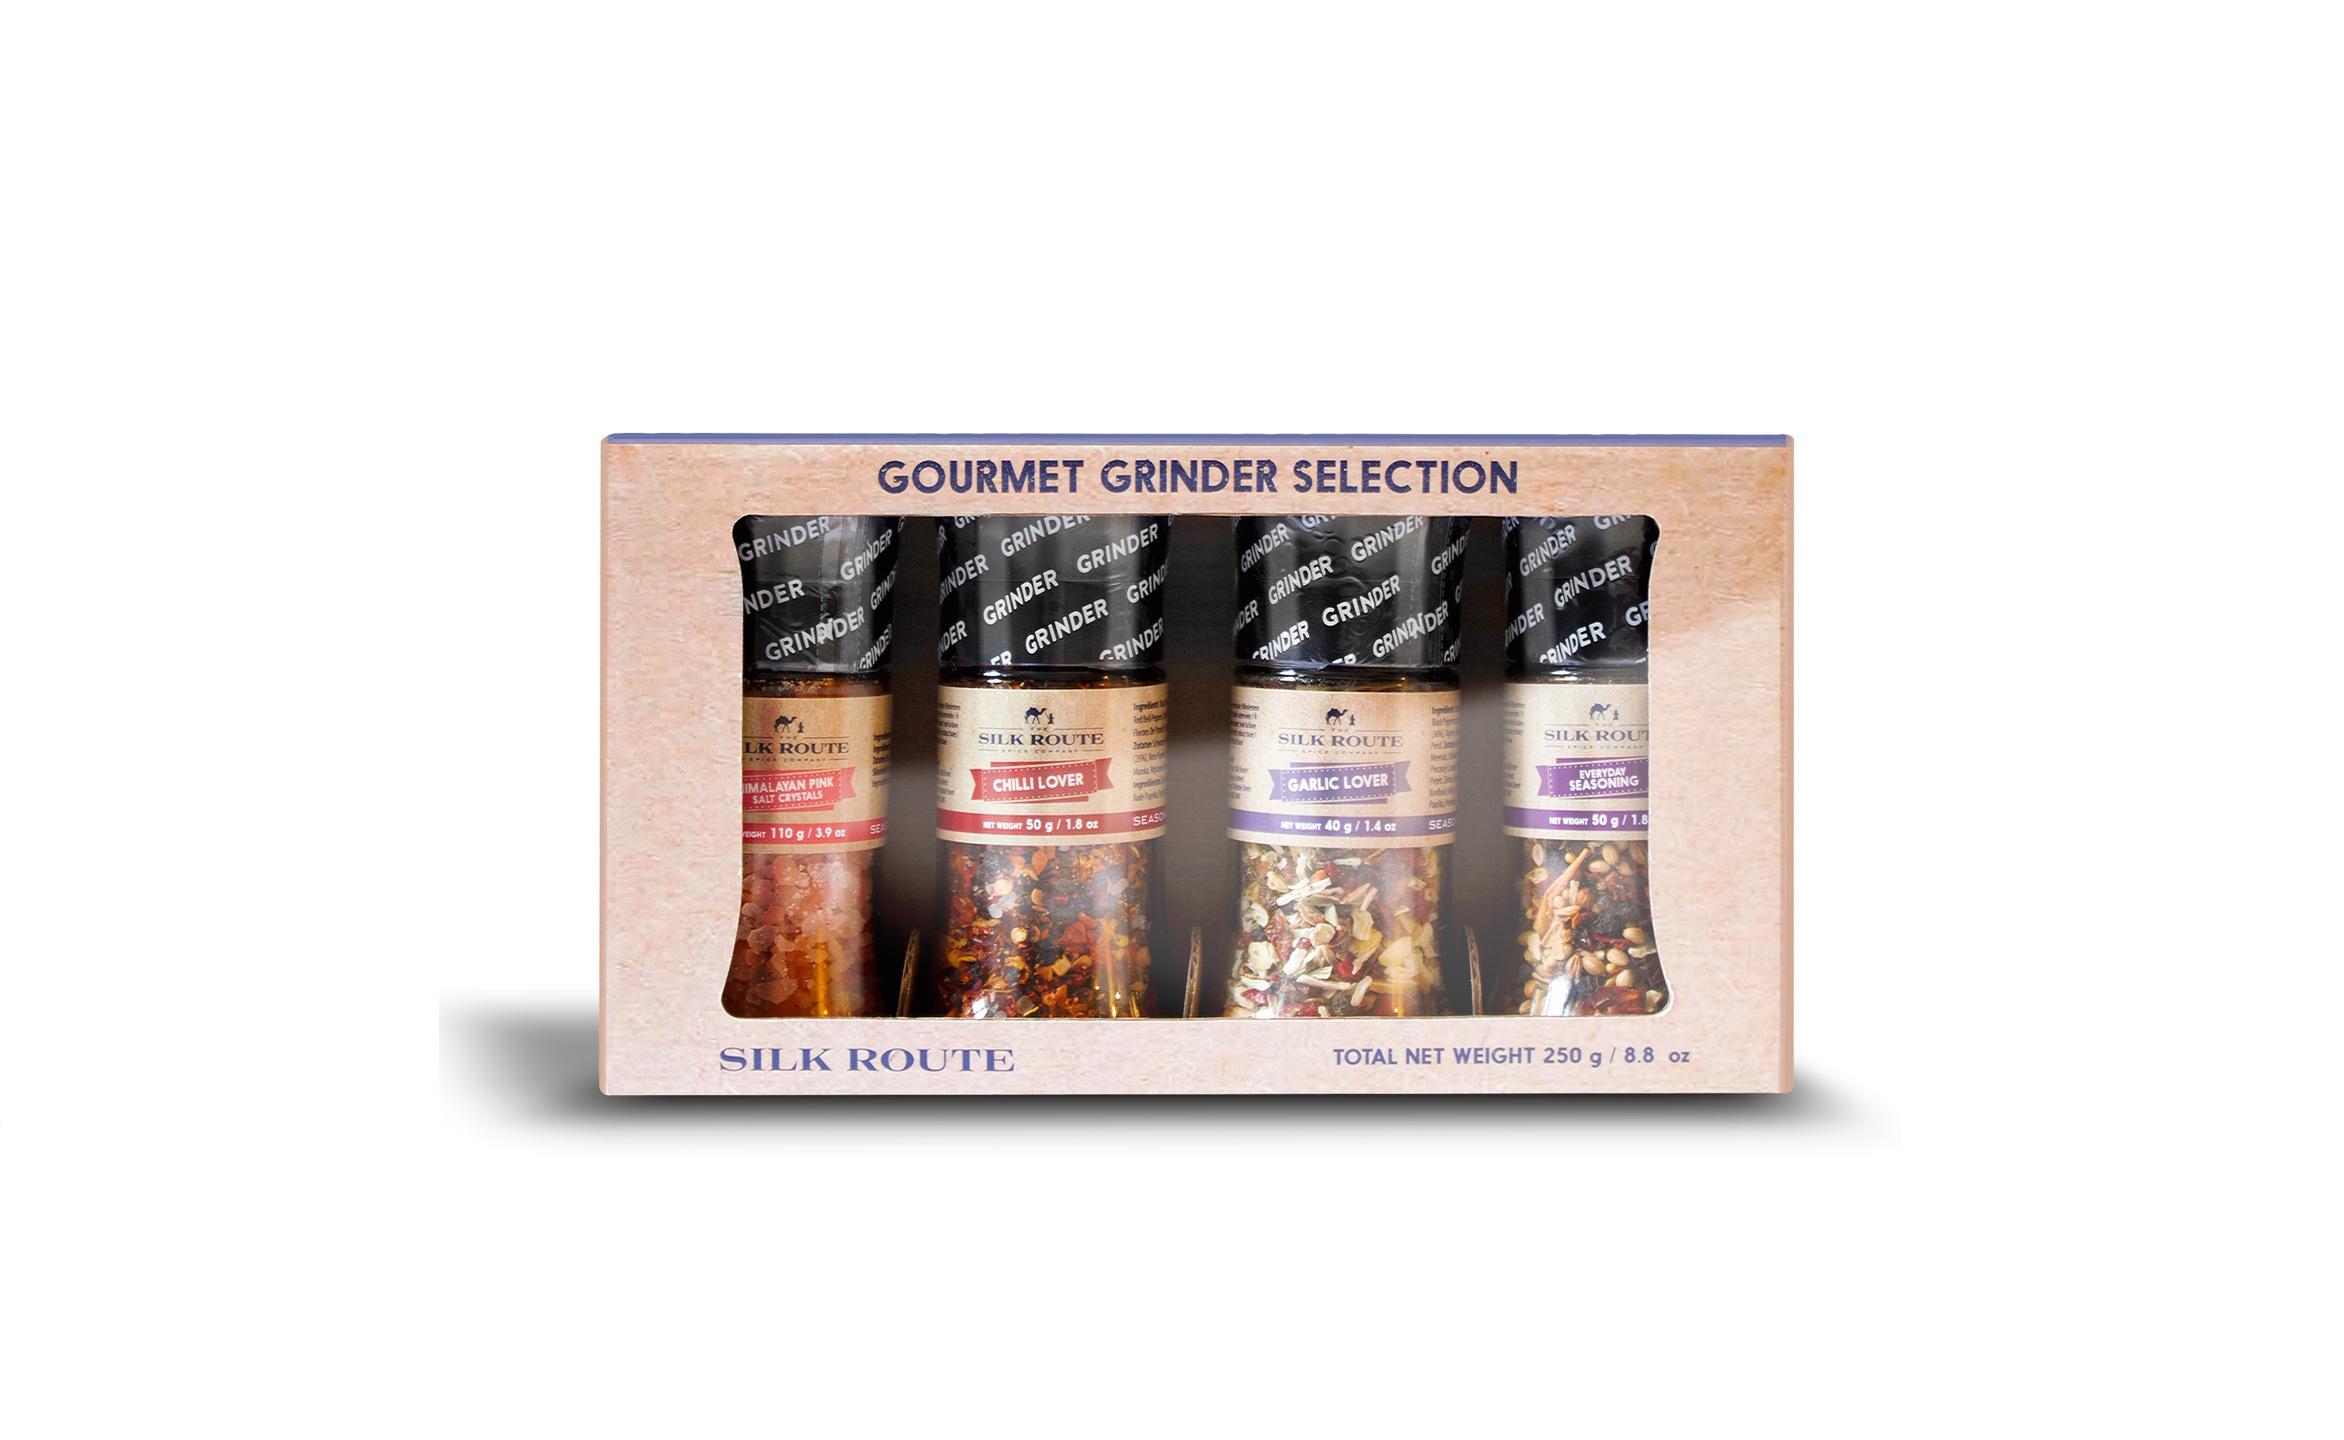 Silk-route-gourmet-grinder-selction-front.jpg